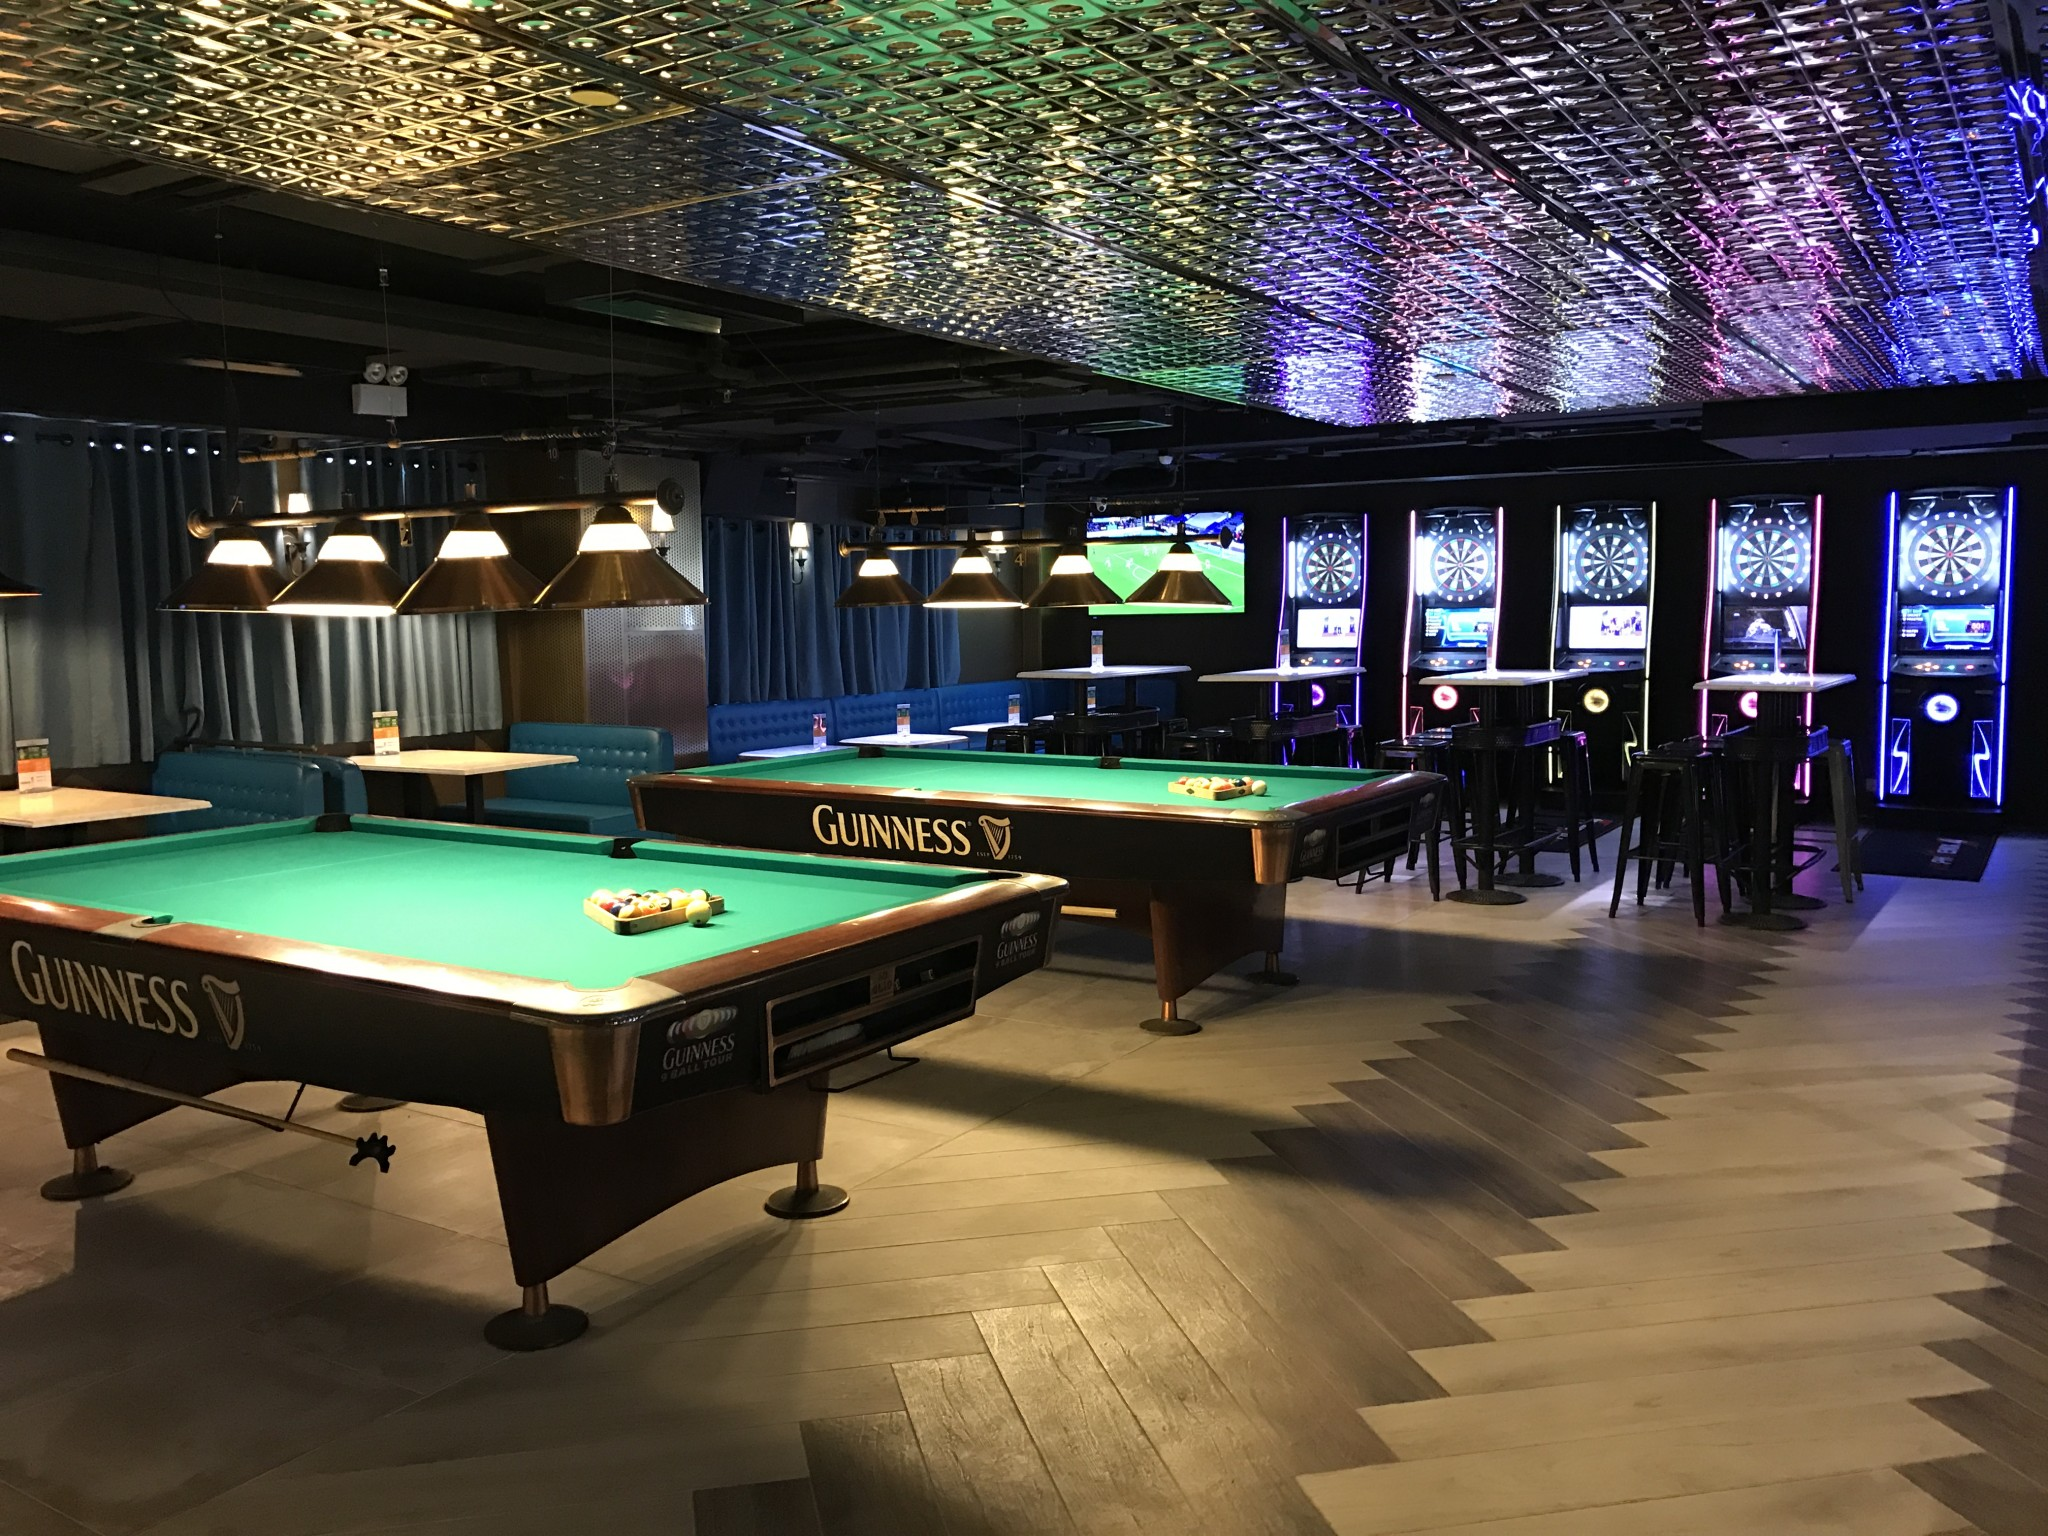 Temple Street 油麻地廟街Joe's Billiards & Bar酒吧 桌球 飛鏢 Beer Pong